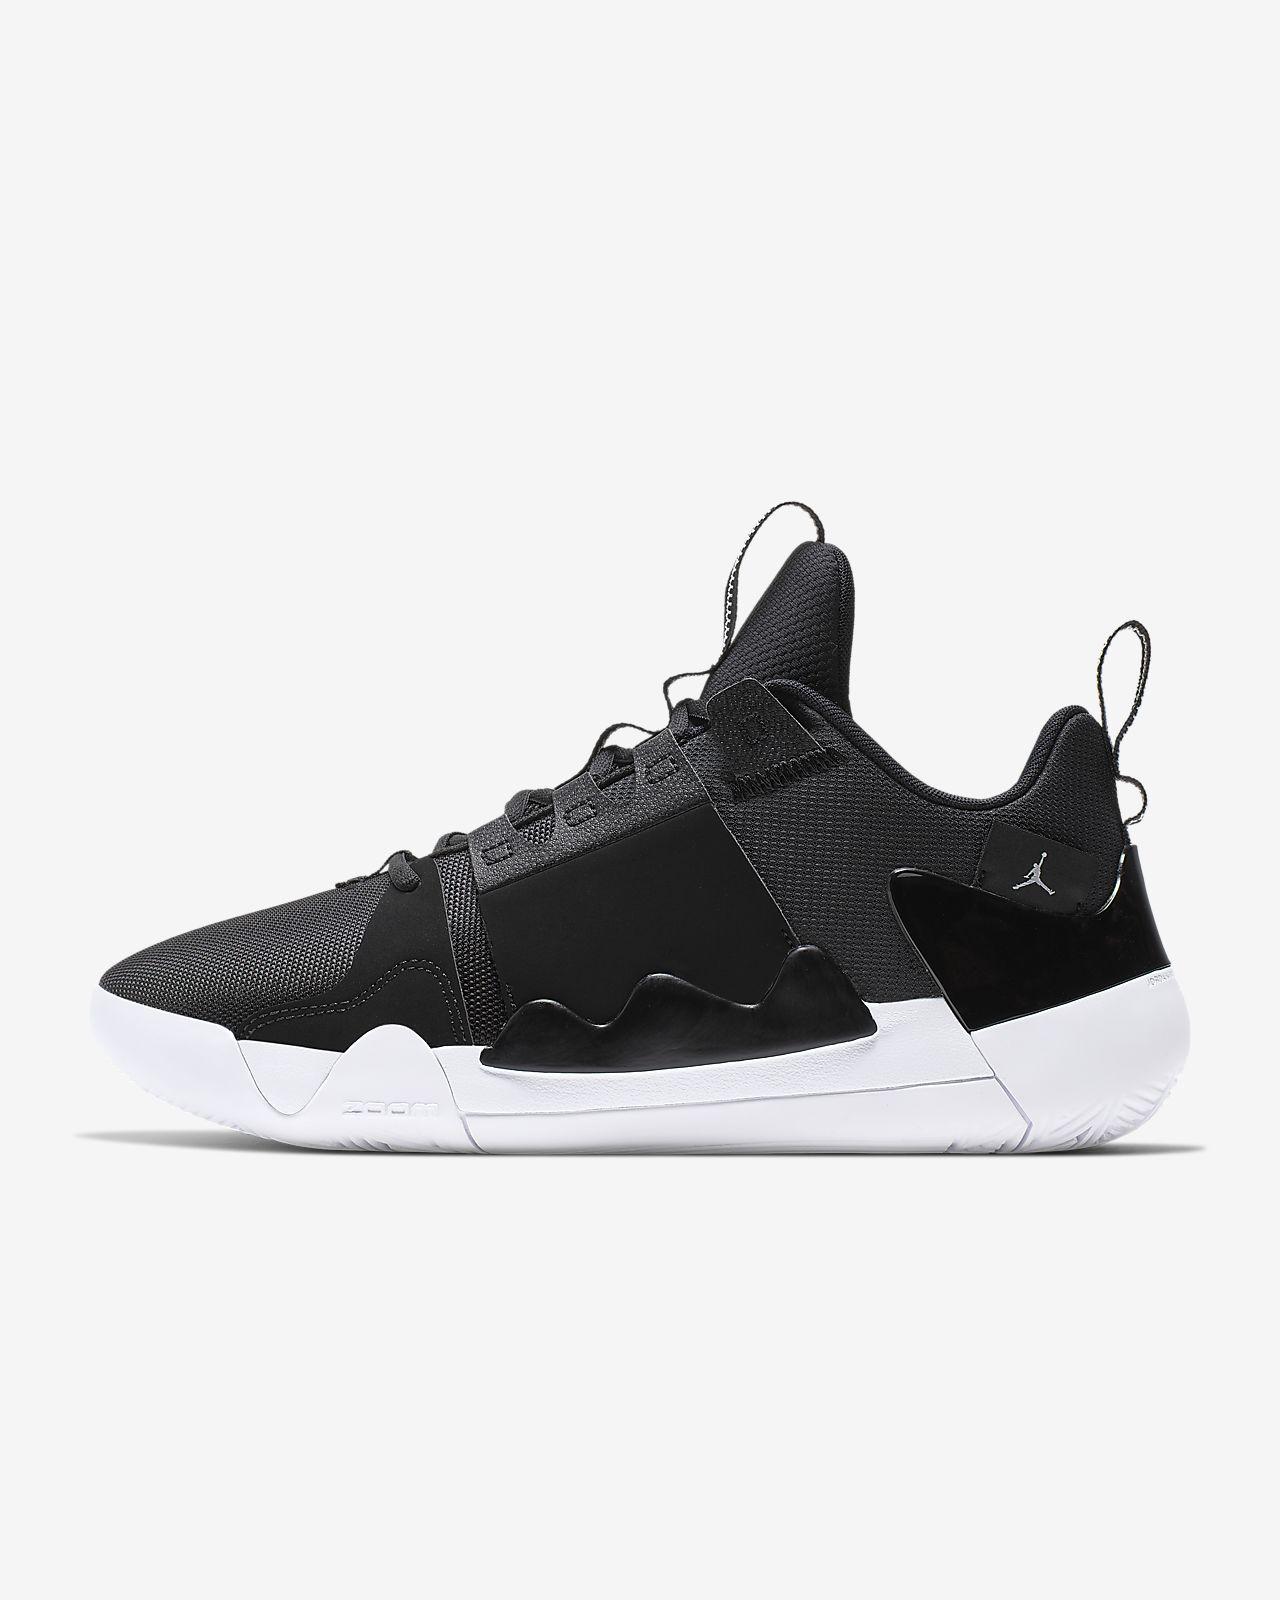 online store ae285 80809 ... Chaussure de basketball Jordan Zoom Zero Gravity